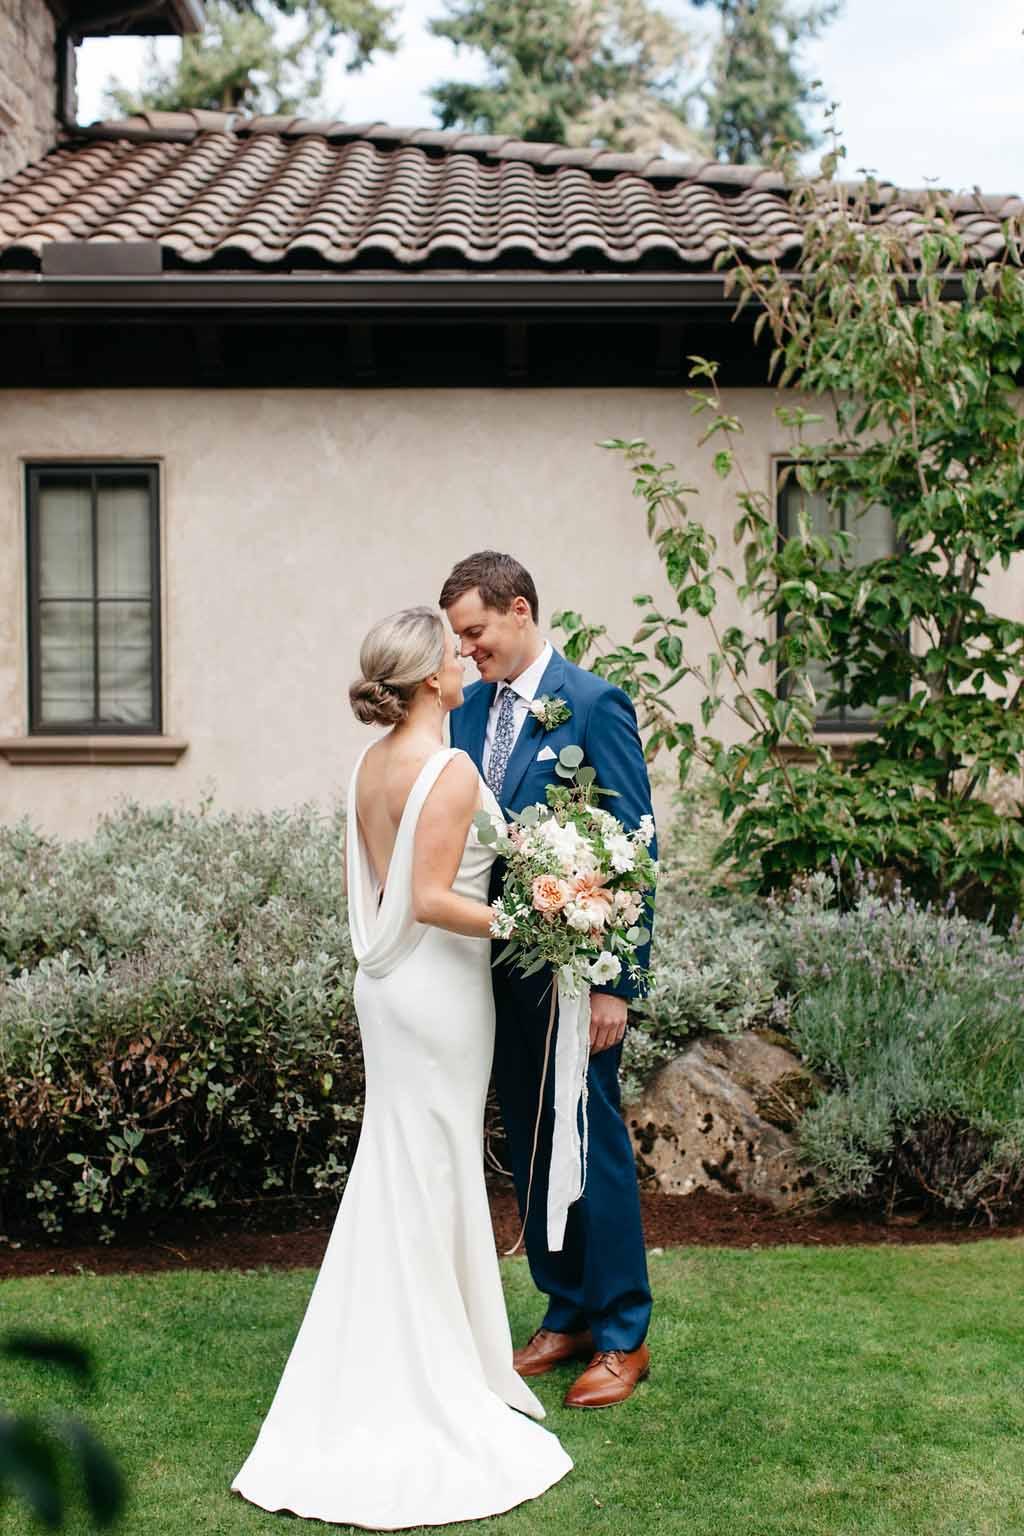 Bride and groom at their garden wedding - designed by Flora Nova Design Seattle